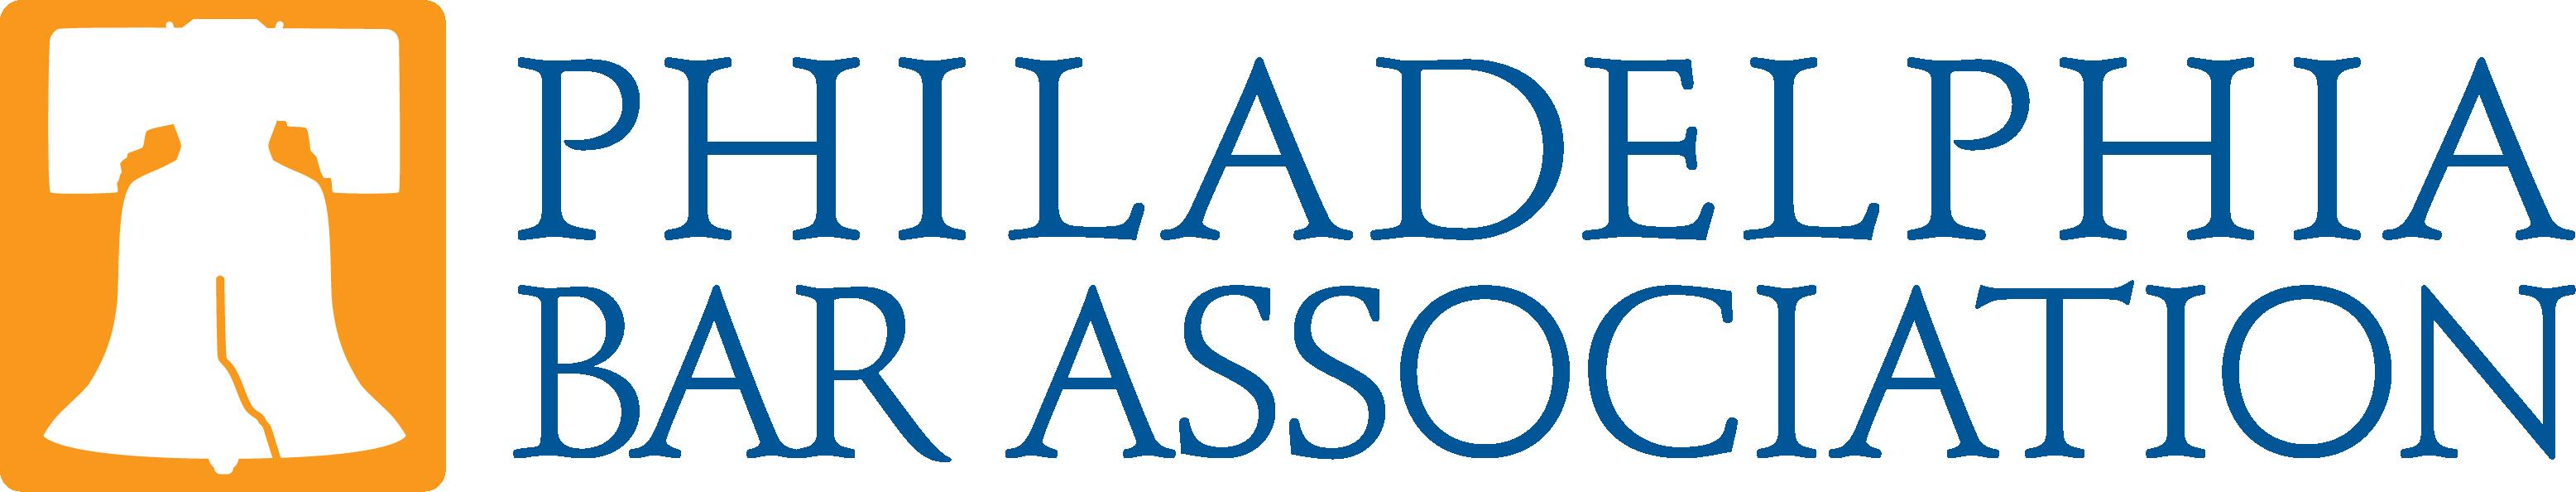 The Philadelphia Bar Association